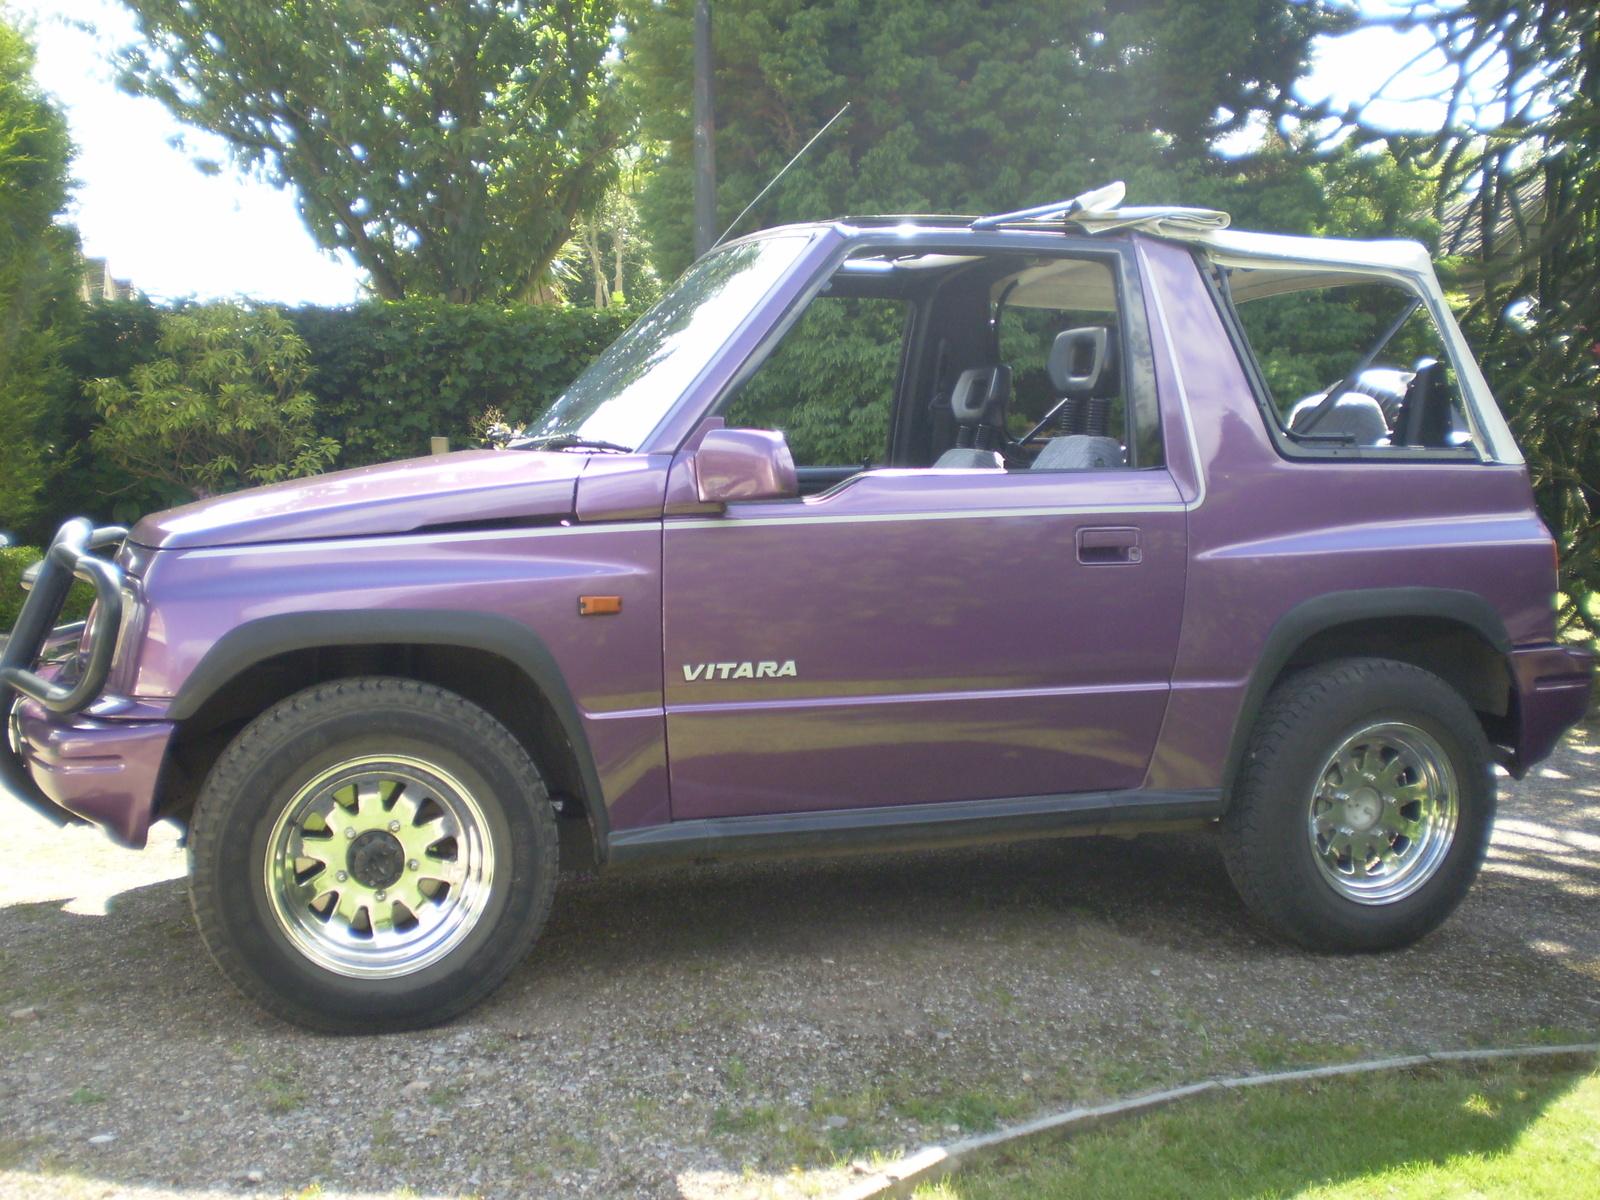 Picture of 1999 suzuki vitara 2 dr jx 1 6 4wd convertible exterior